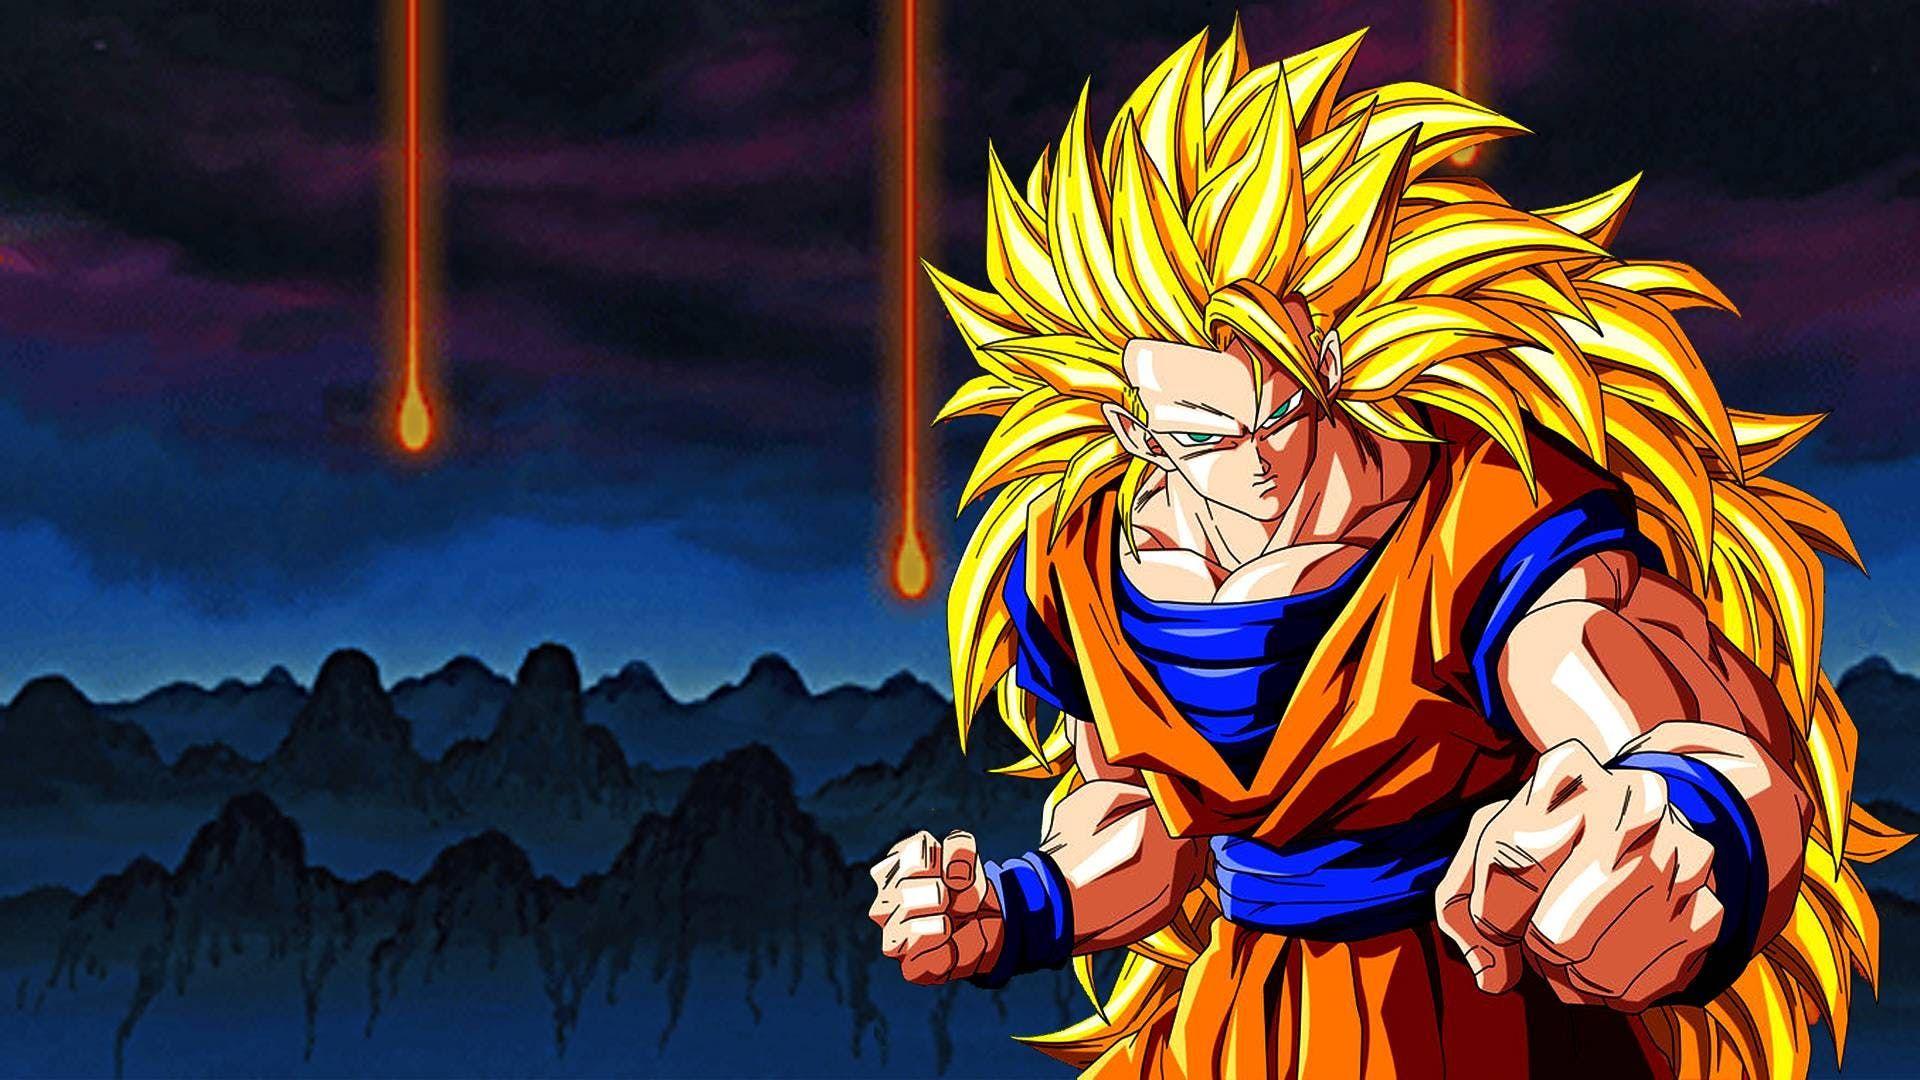 Comic Legends Why Did Gokus Hair Turn Blonde Dragon Ball Wallpapers Goku Wallpaper Dragon Ball Super Wallpapers